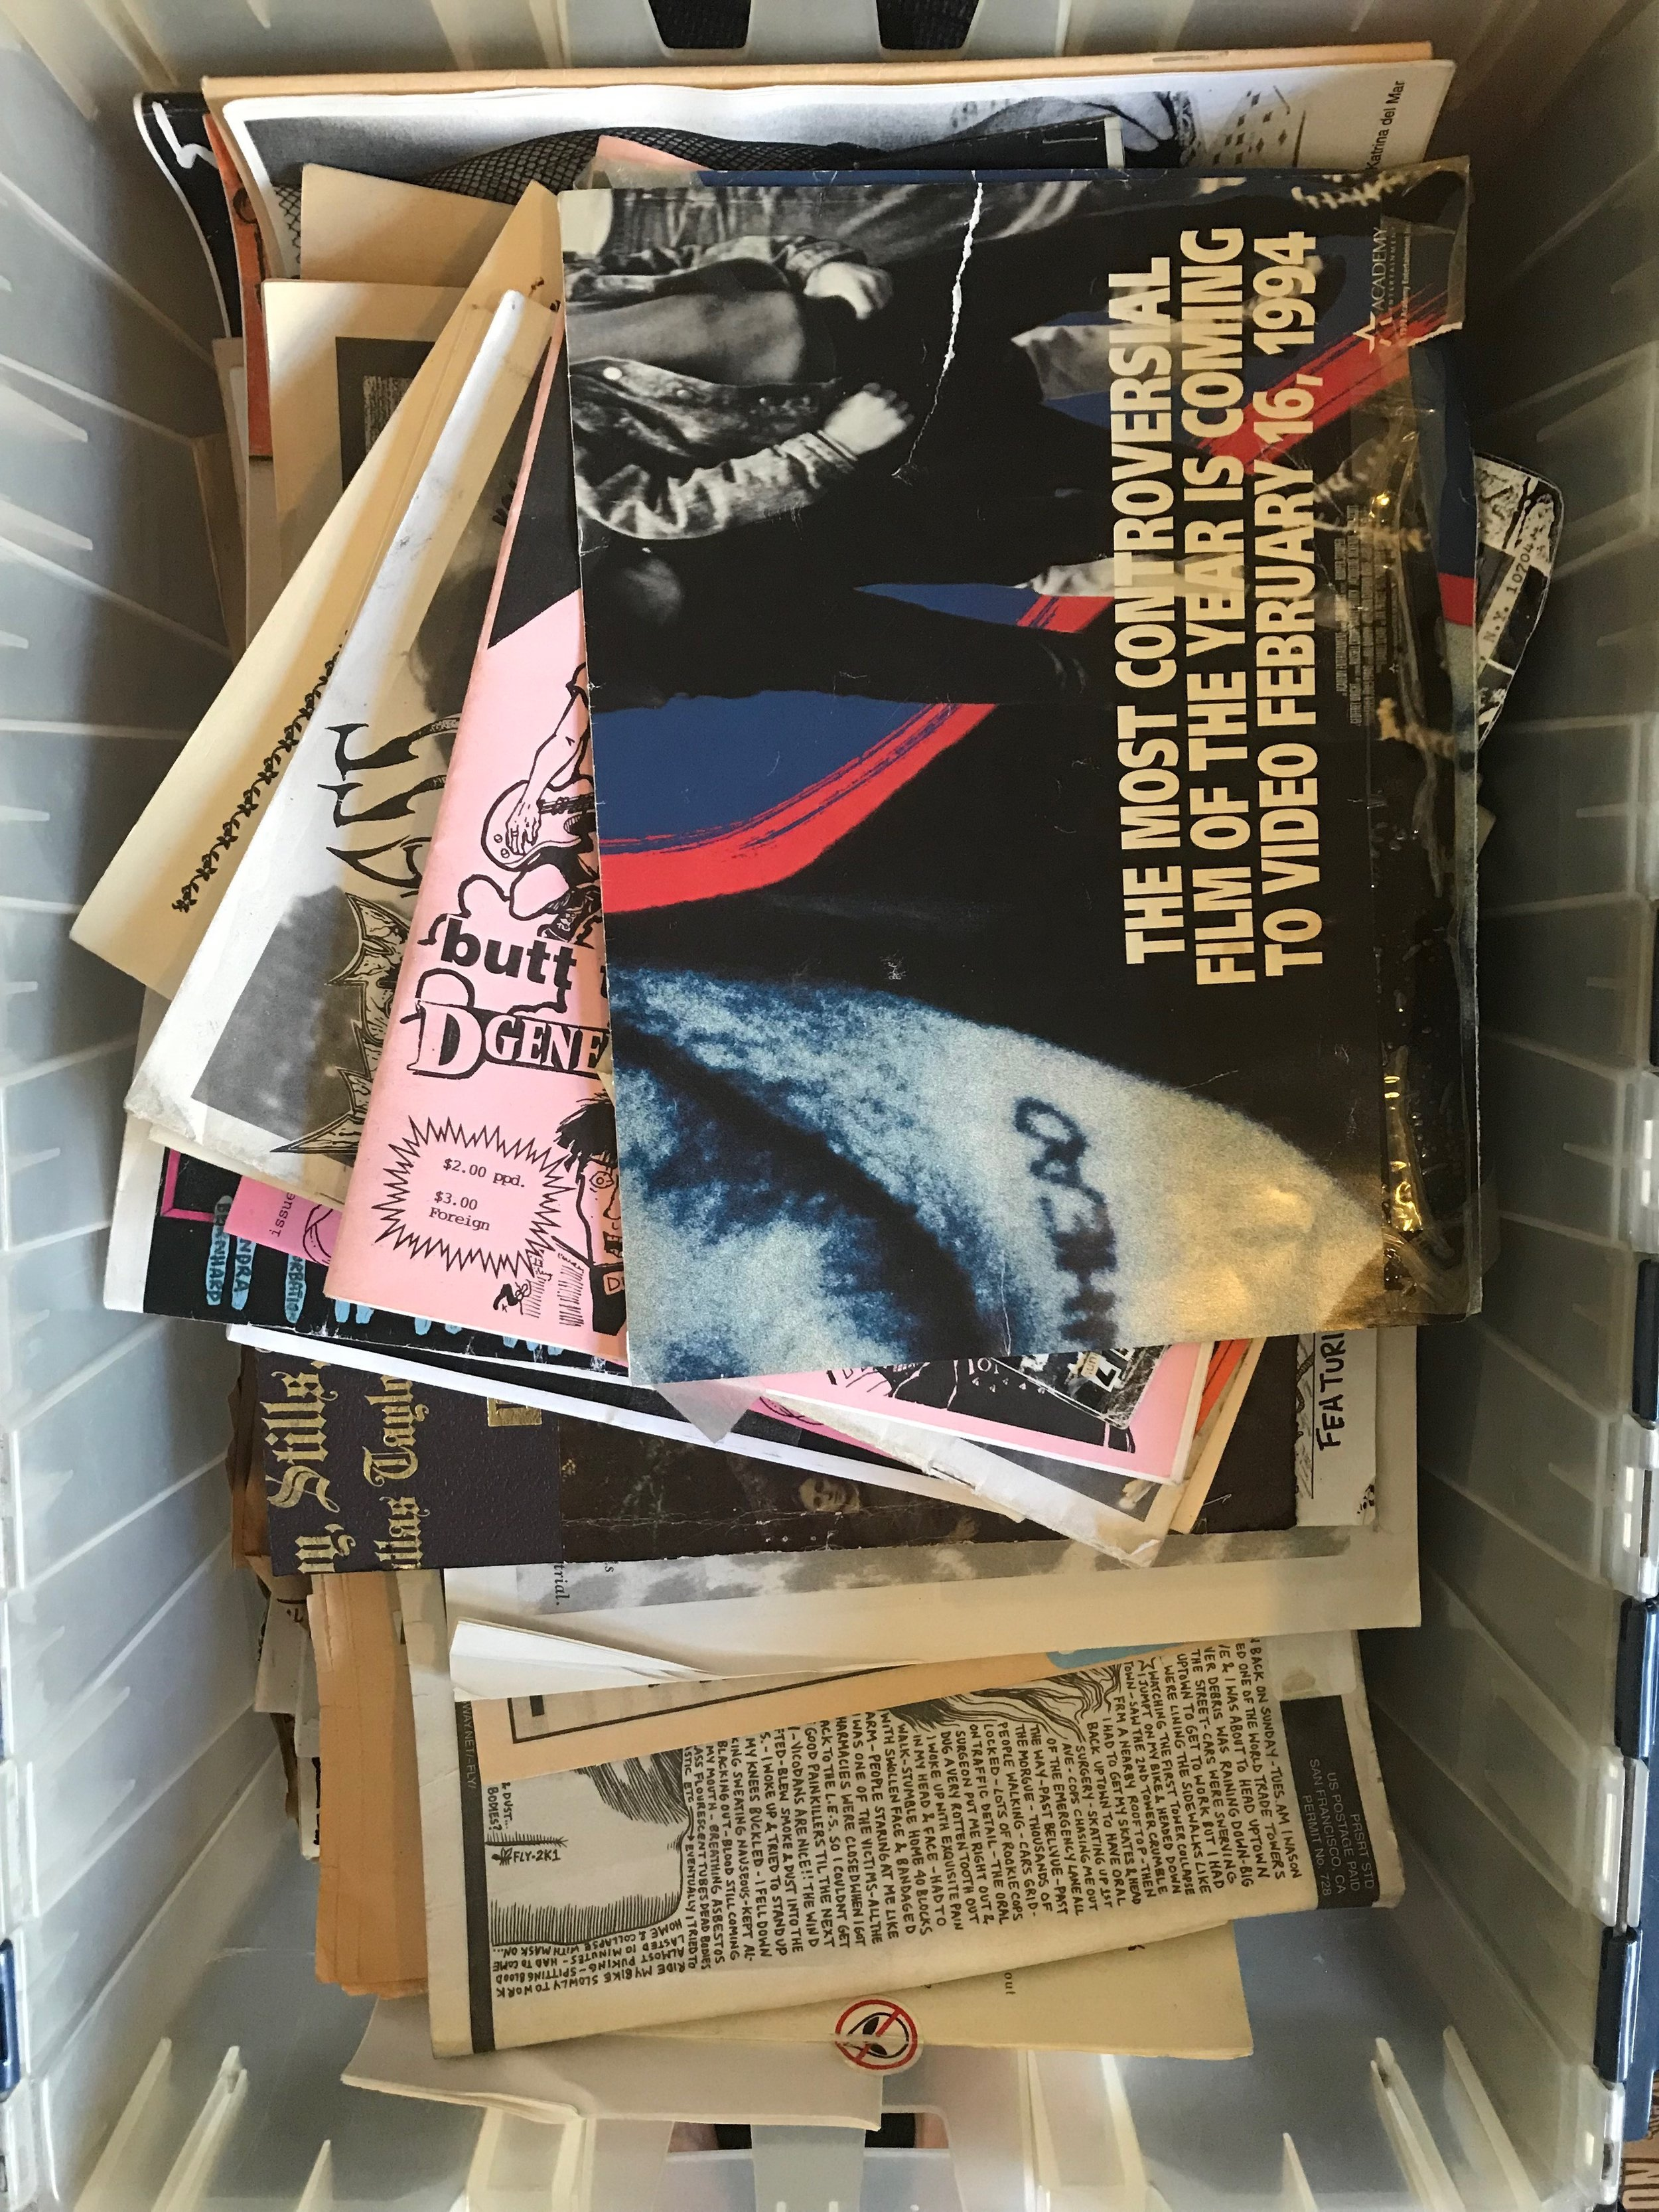 A bin of zines, including a  Romper Stomper  poster!